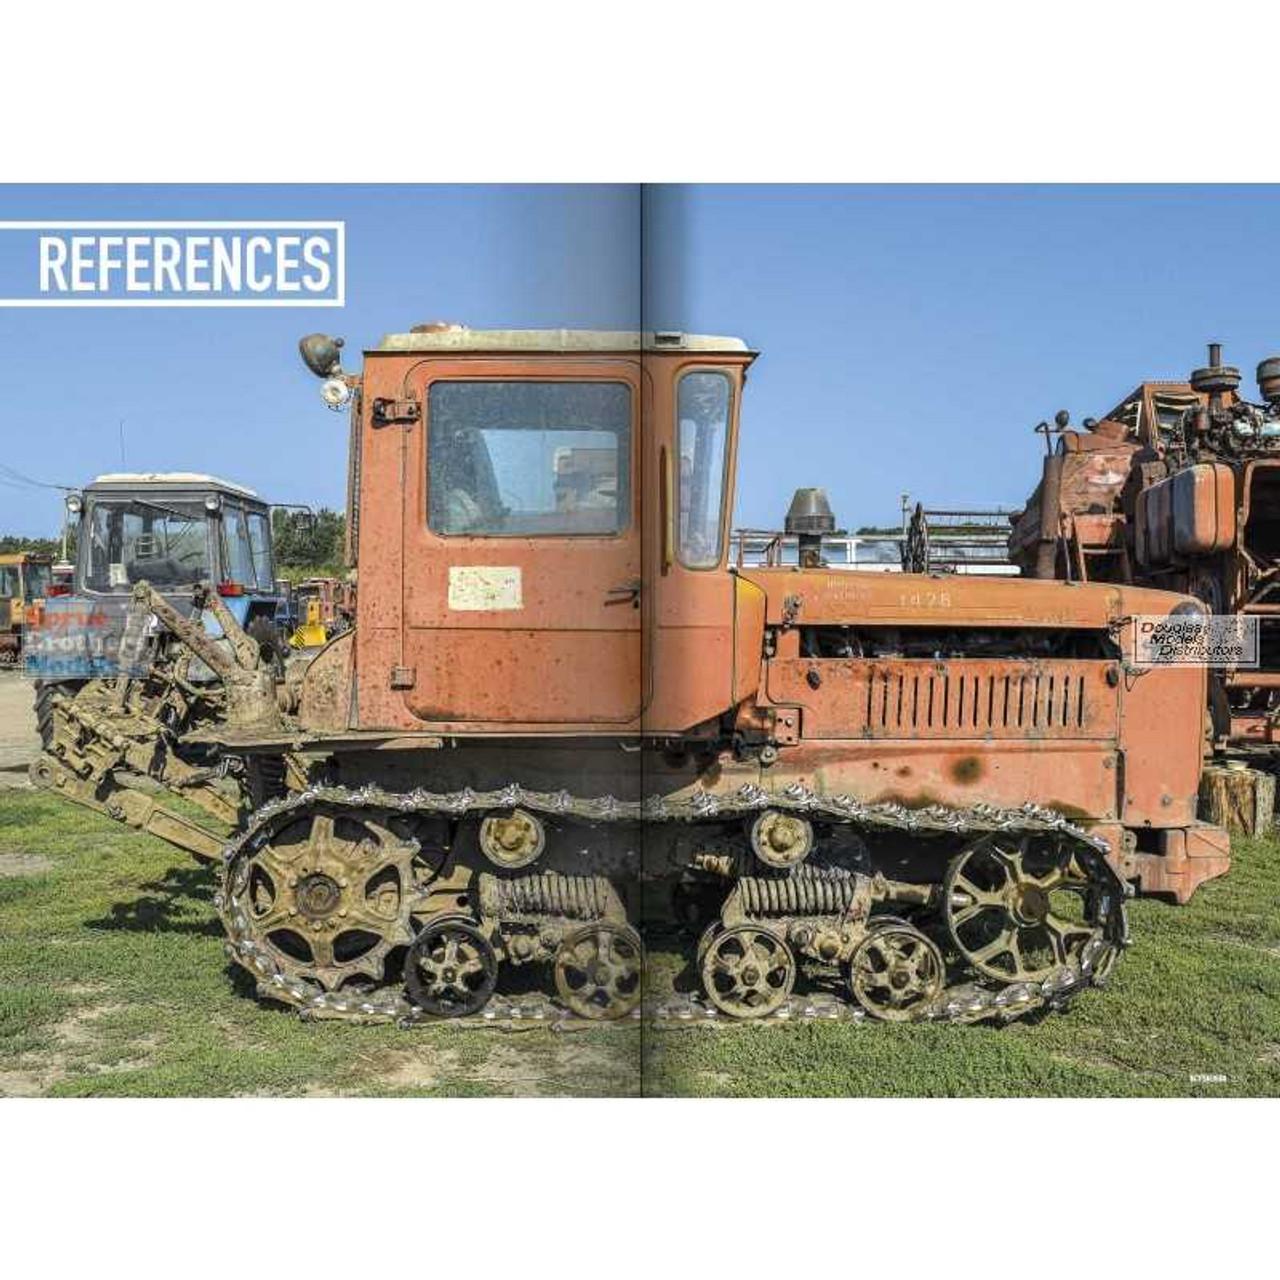 PLESP008 PLA Editions - Tractors: Modelling Eastern European Civil Vehicles